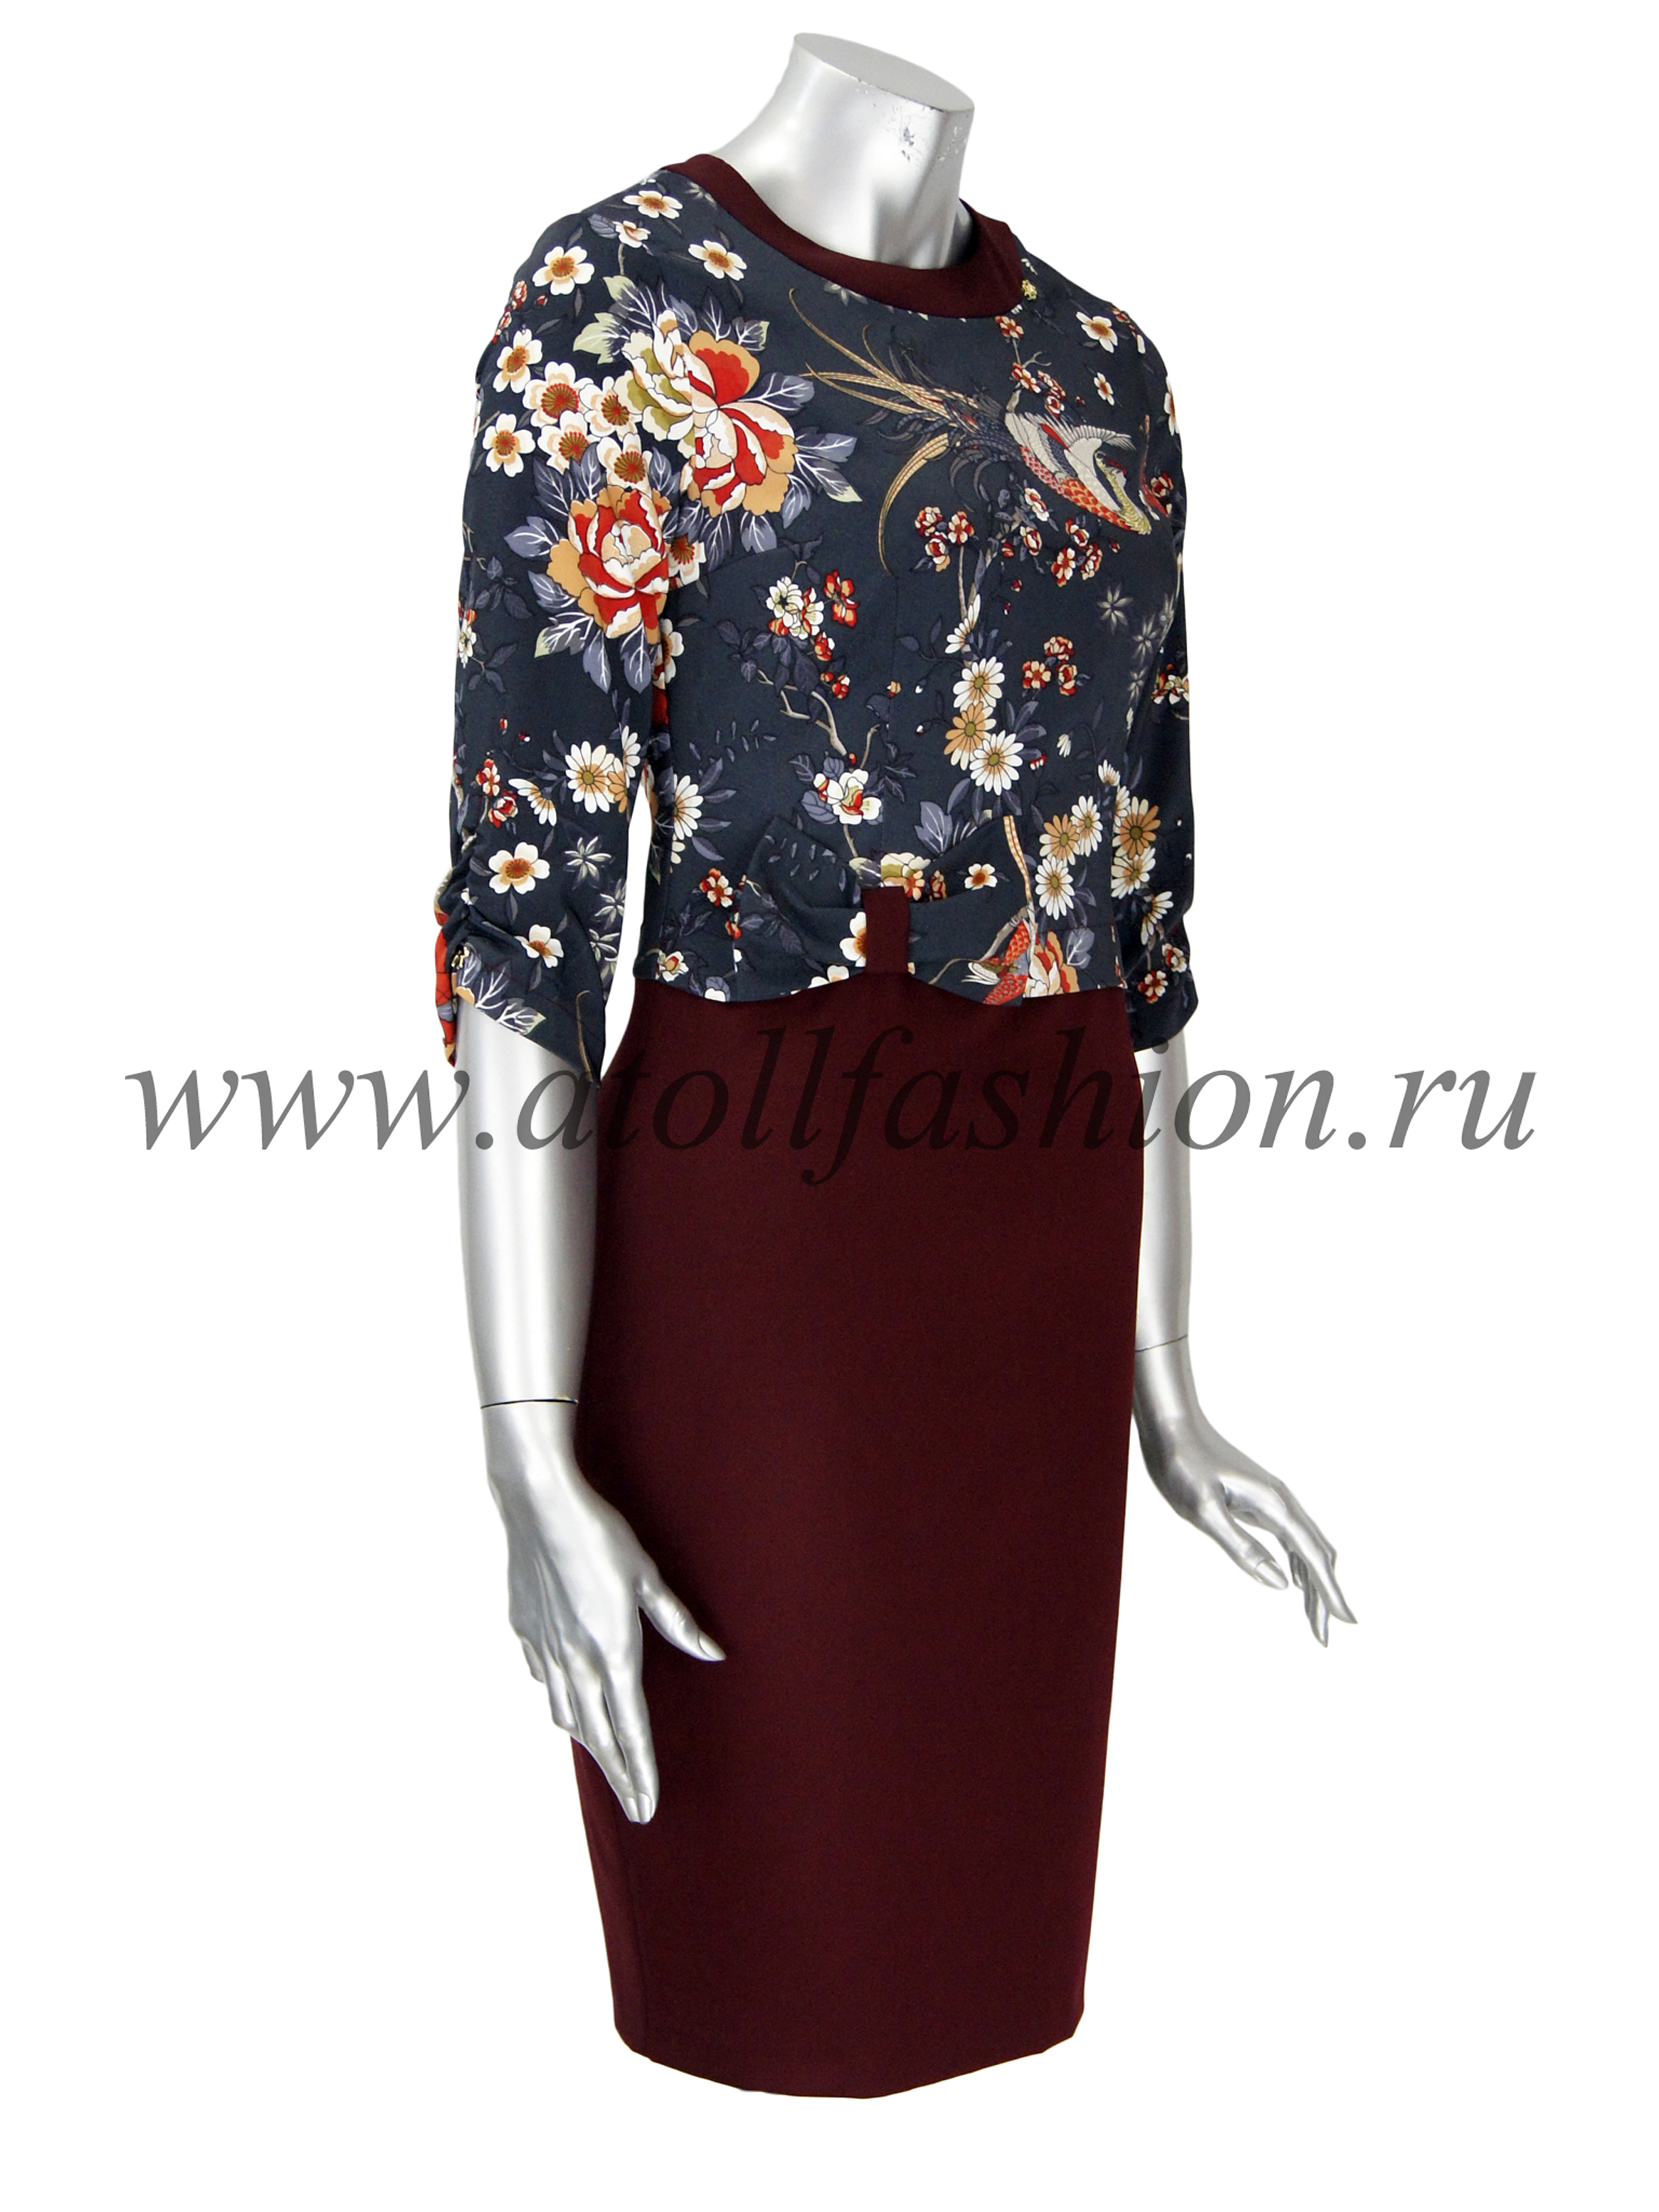 Carla Hotline Женская Одежда